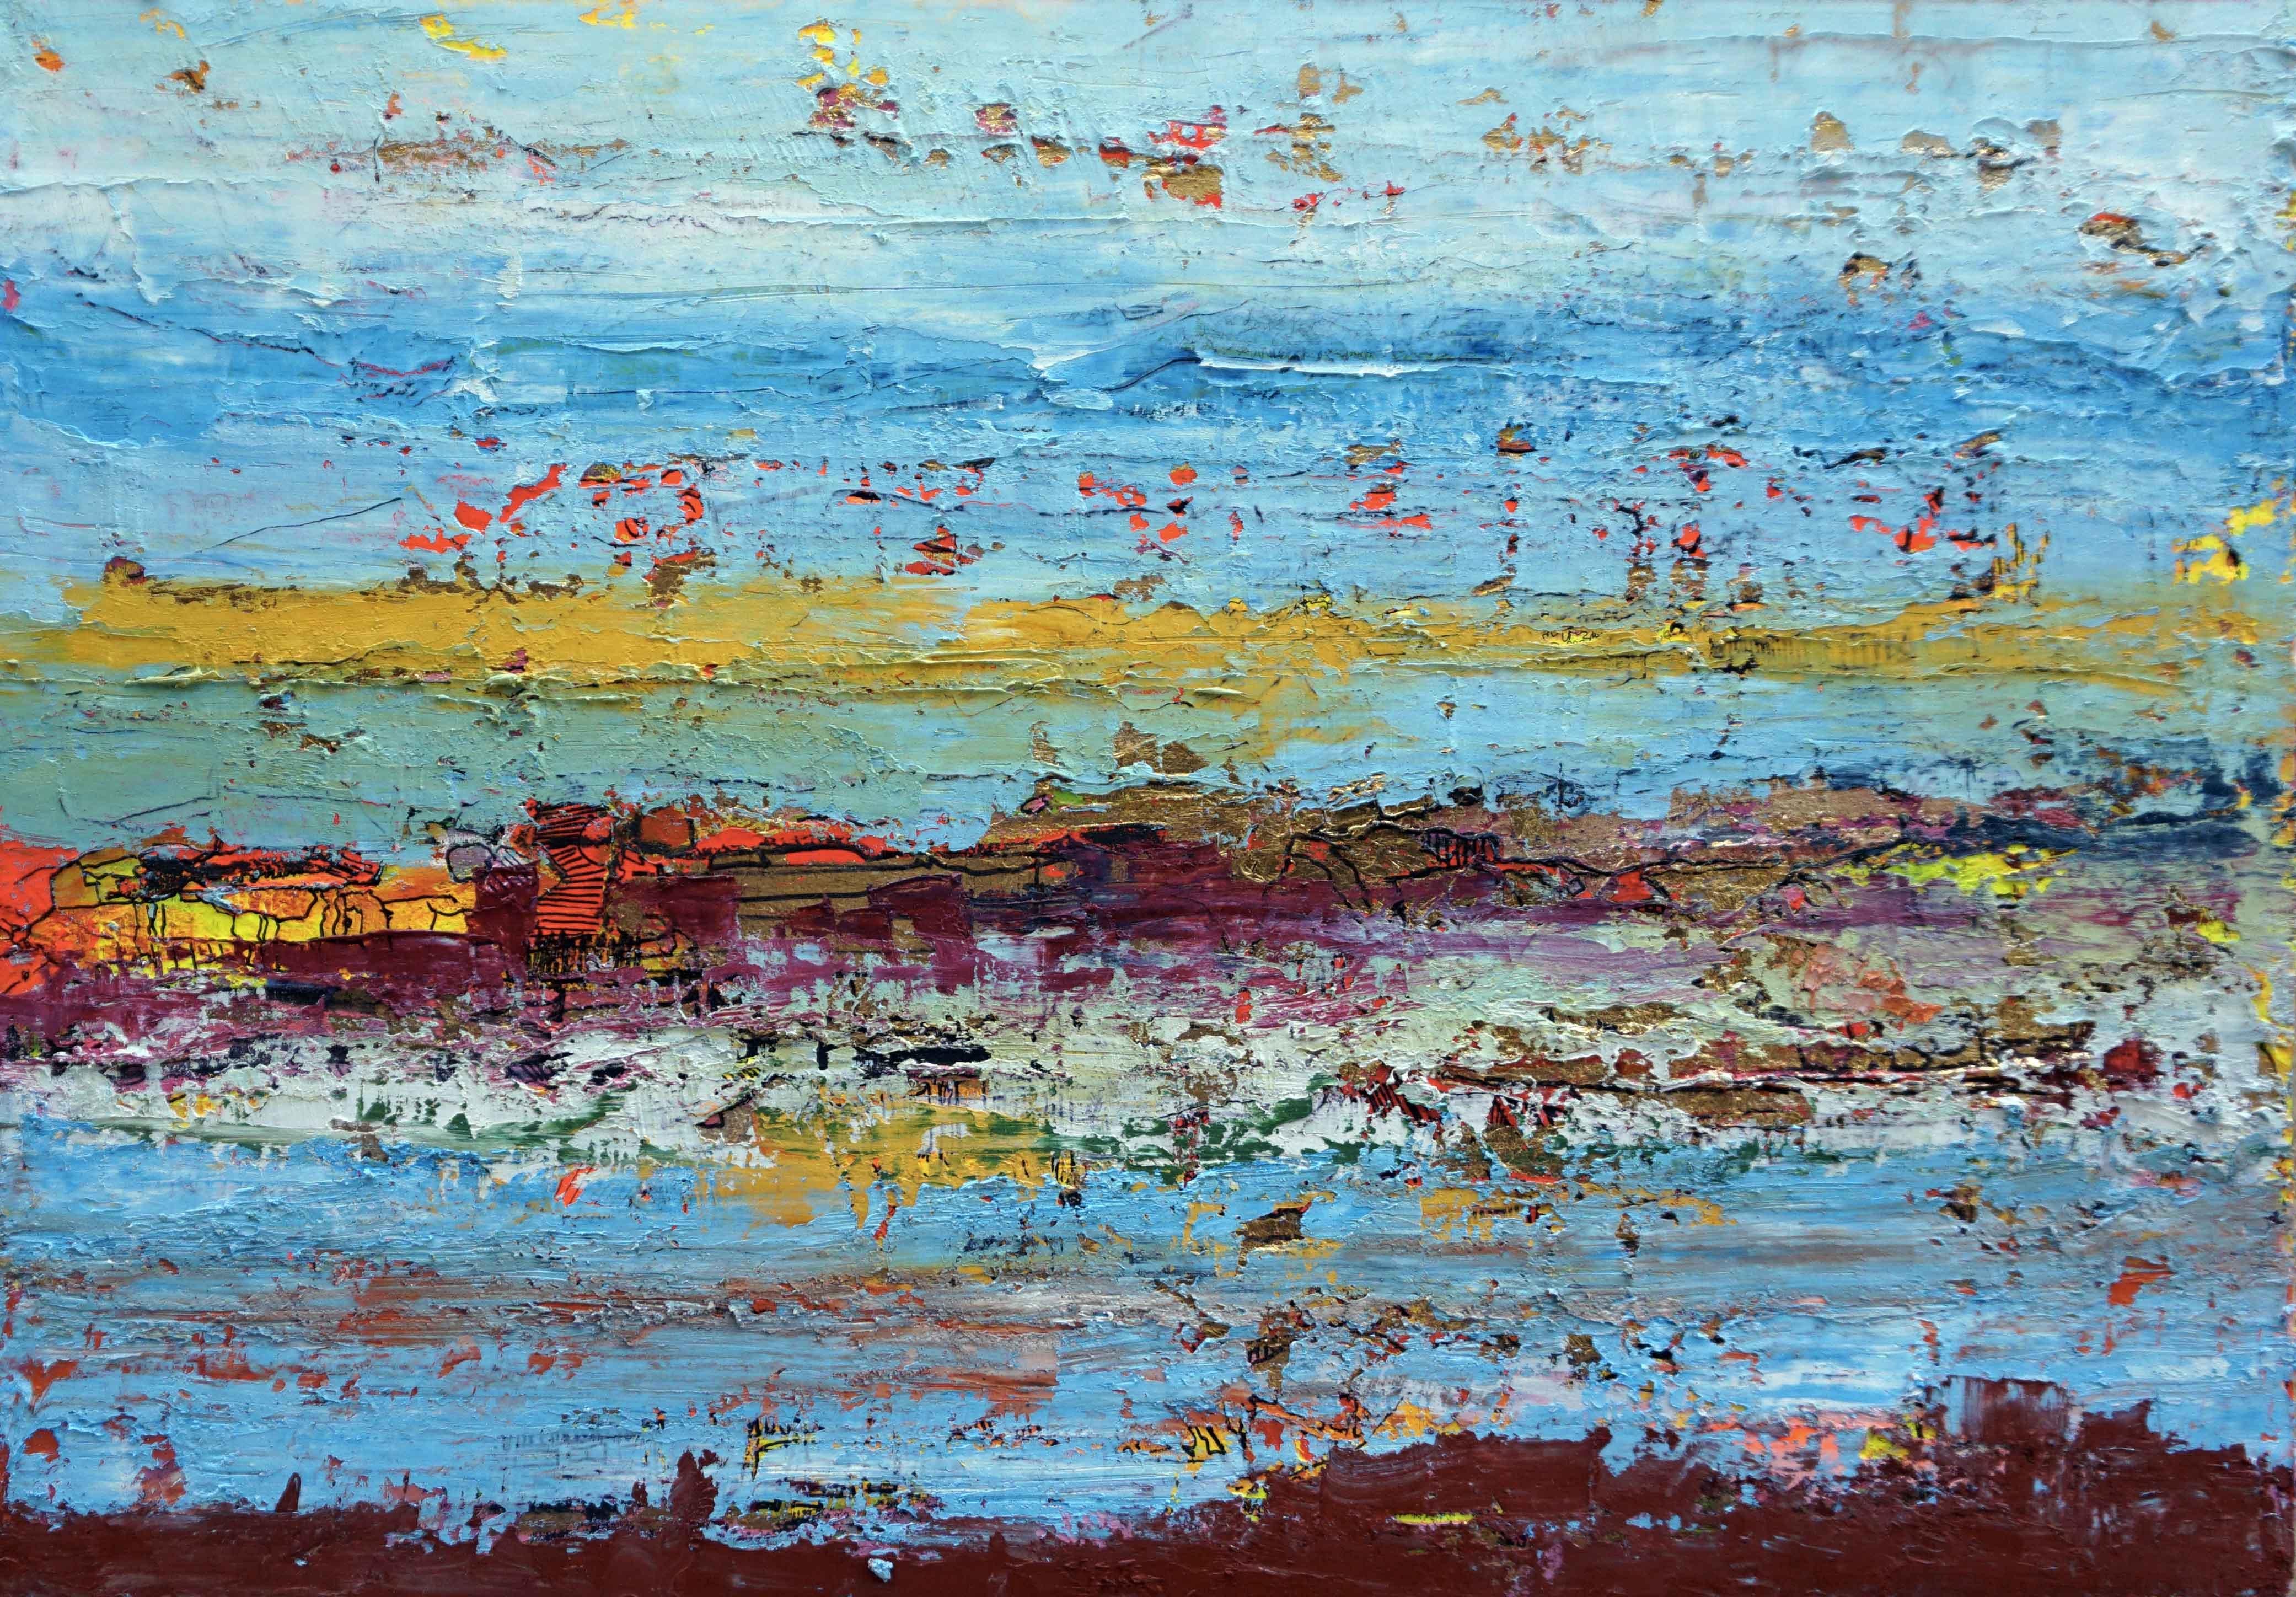 ahmed farid artist - art contemporary - art egypt